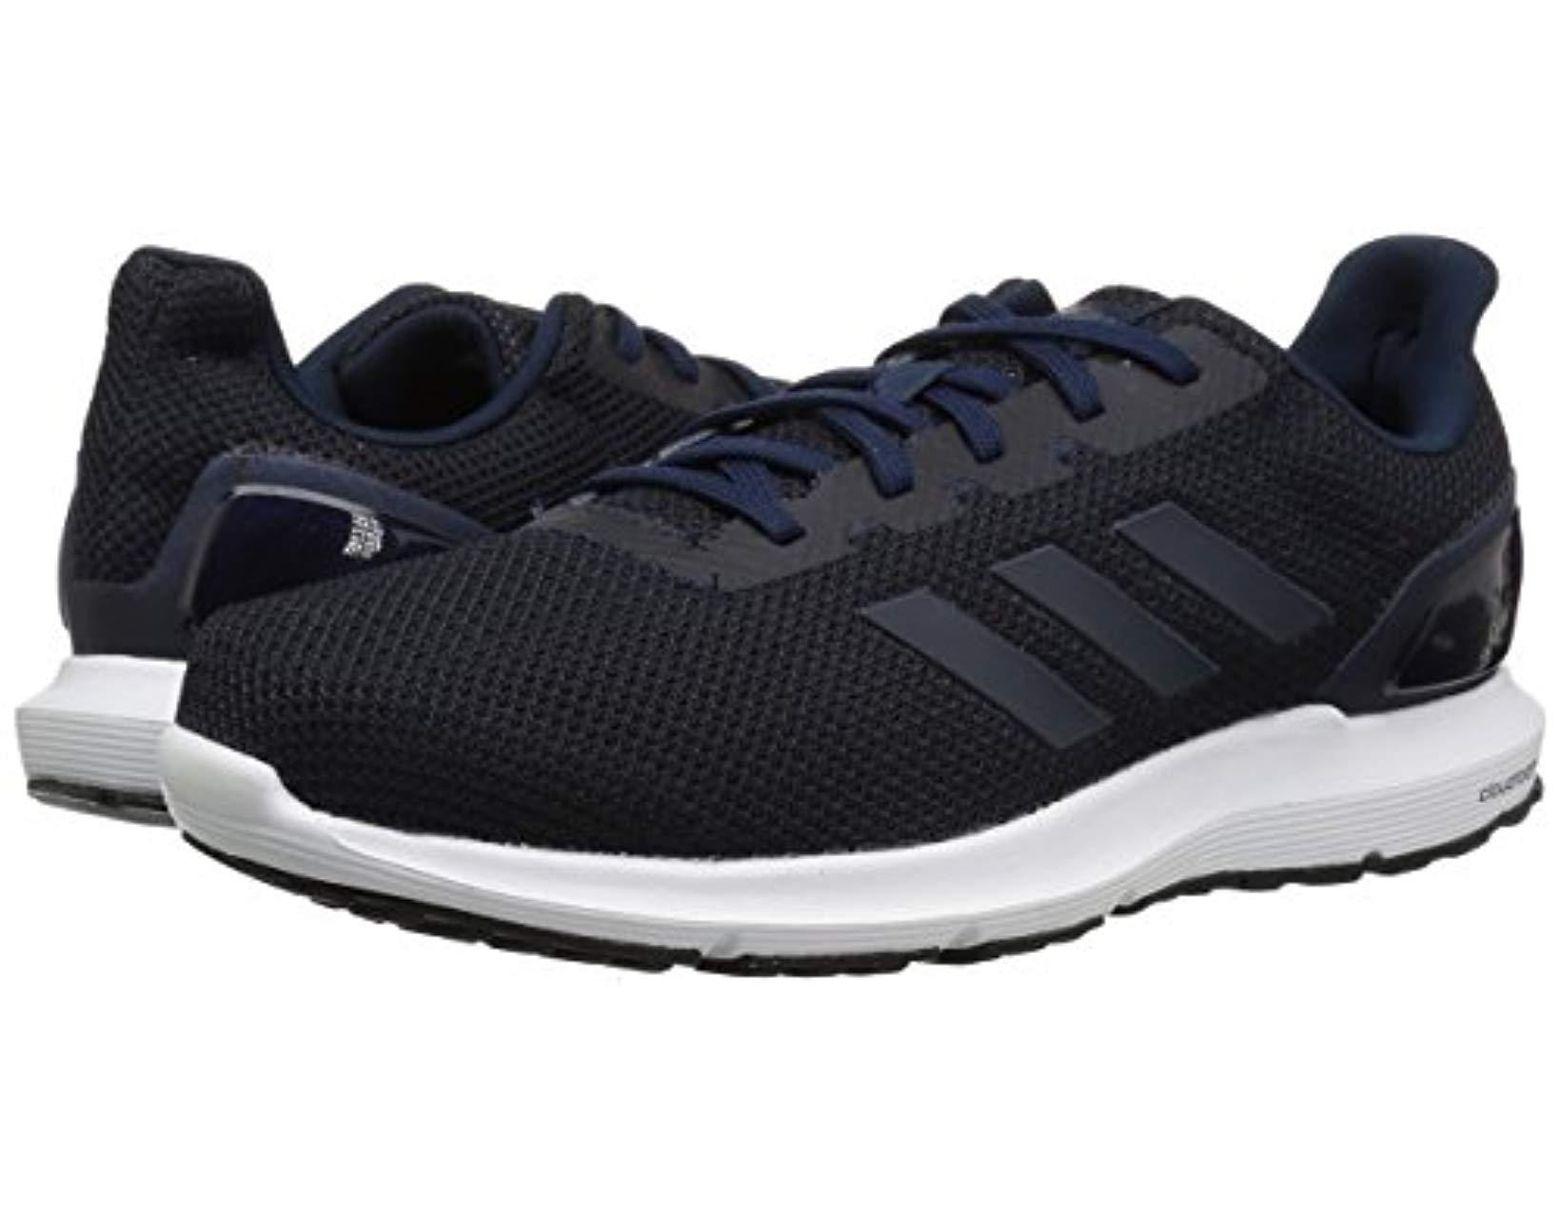 b72a7c8a7f2ad Men's Blue Cosmic 2 Sl M Running Shoe